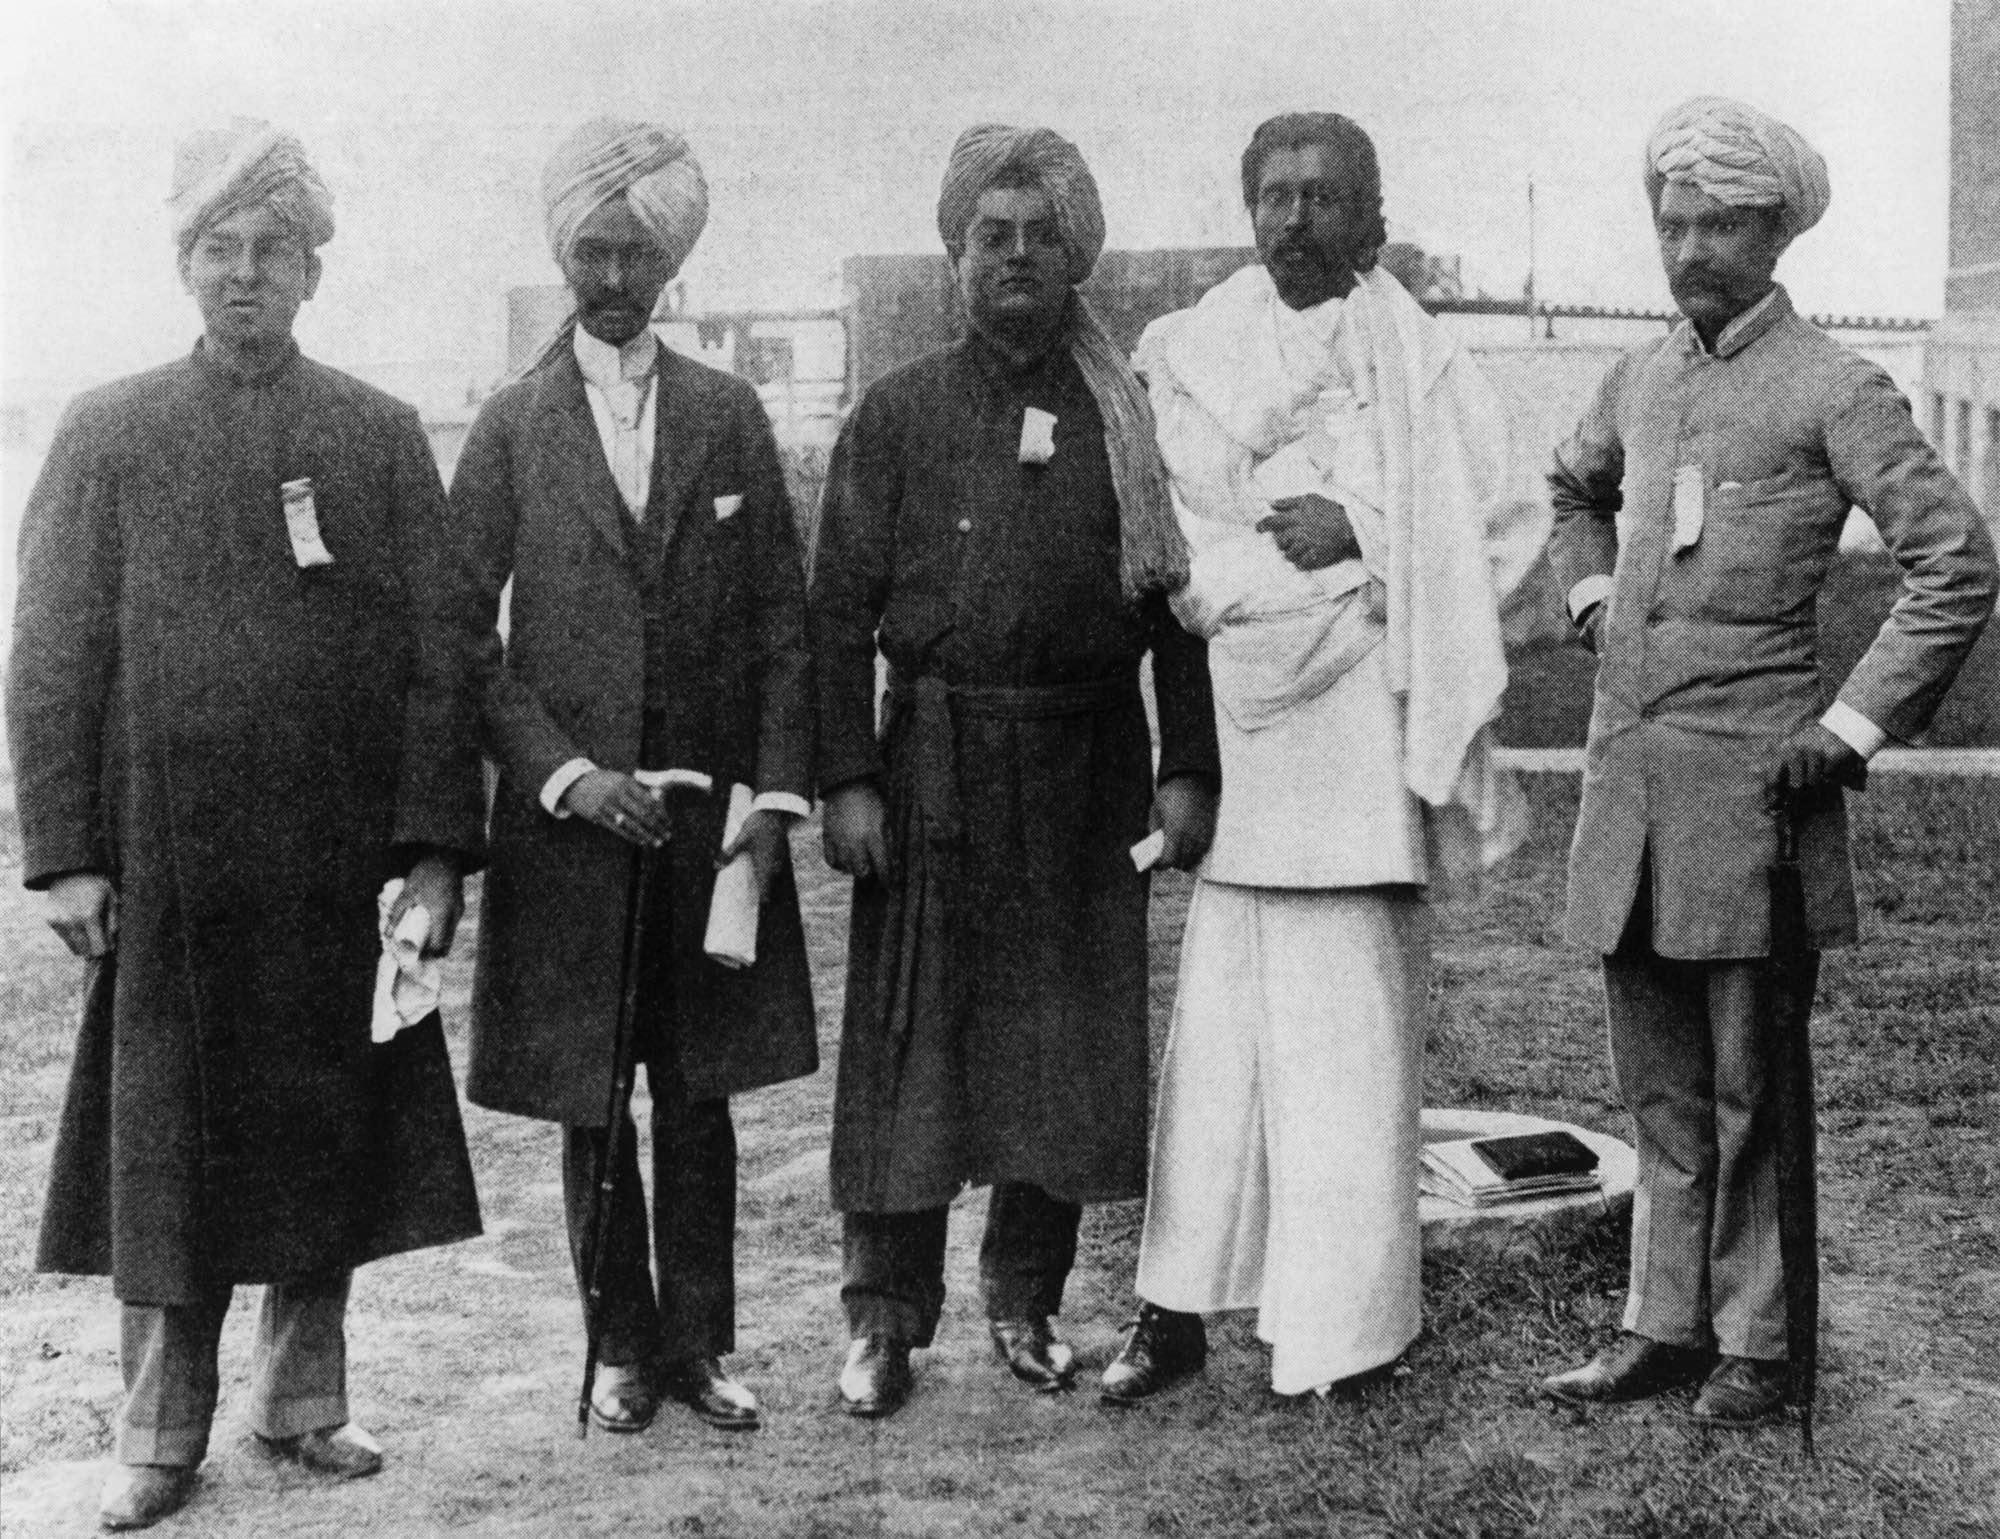 (#14) Chicago, September 1893. (From L) Narasimhacharya from Chennai, Lakshmi Narain from Lahore, Swamiji, H. Dharmapala from Sri Lanka, and Virchand Gandhi from Mumbai.